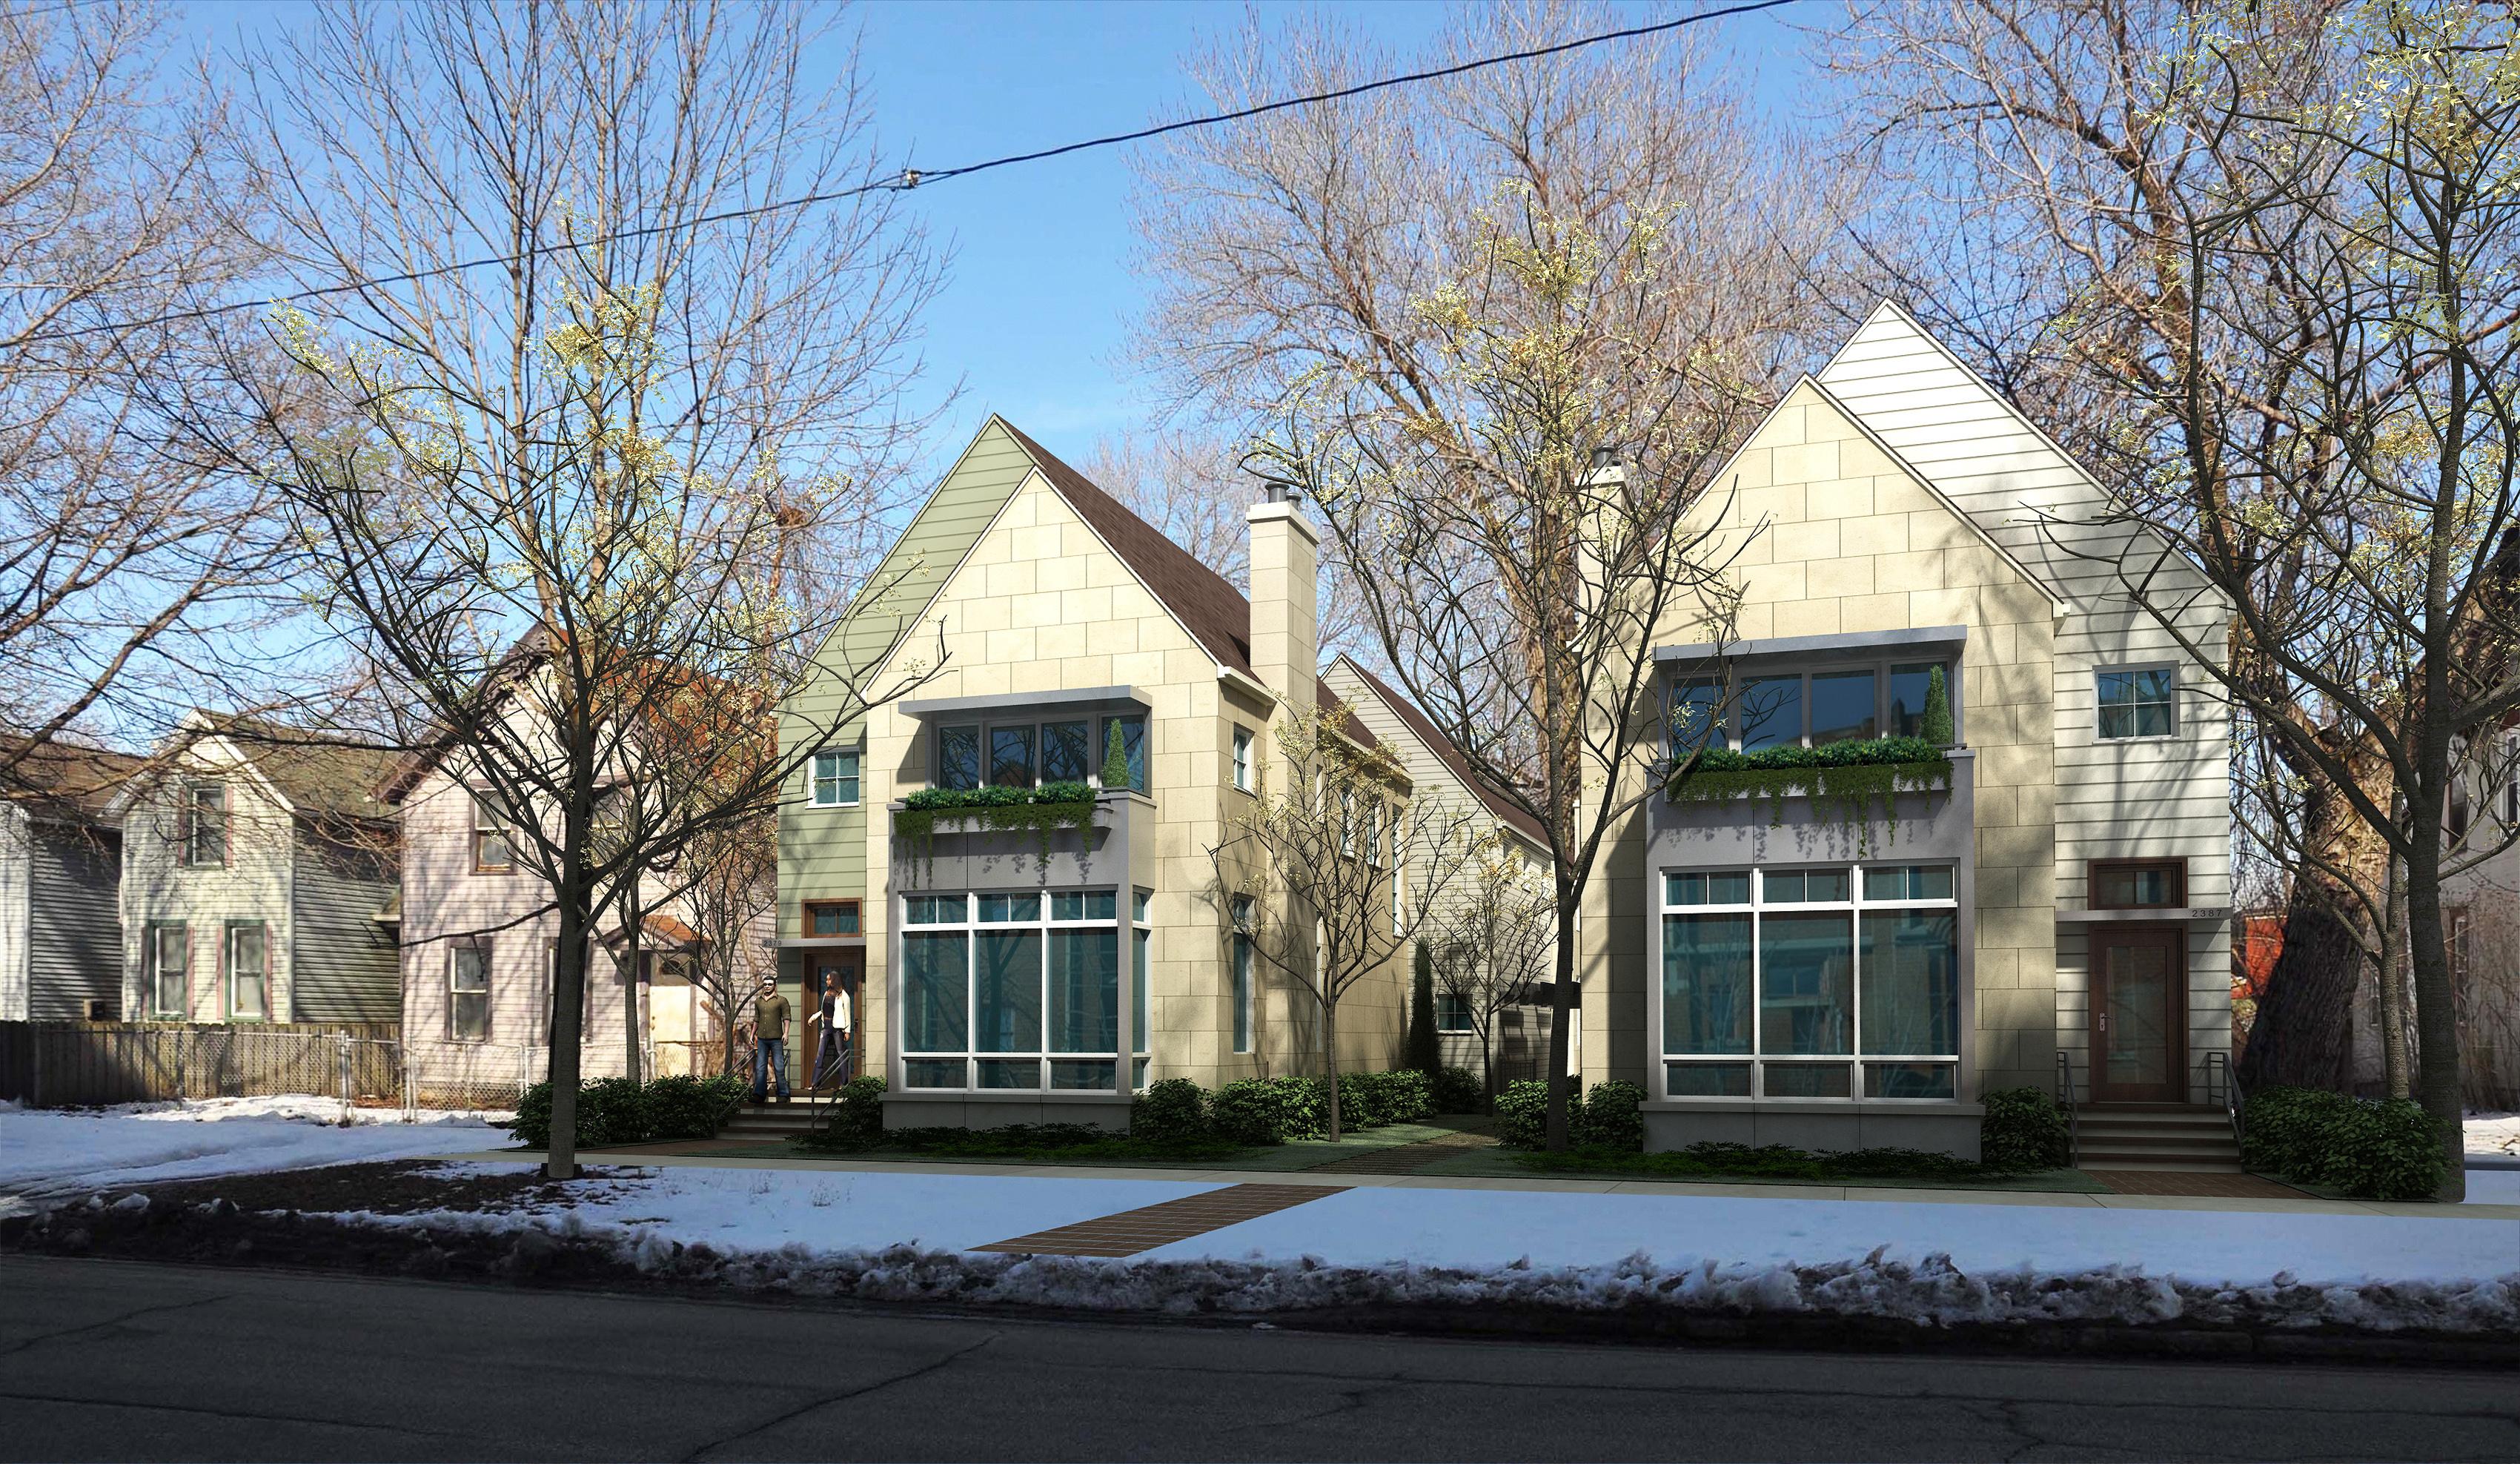 Southside 6 & 7 Street Exterior